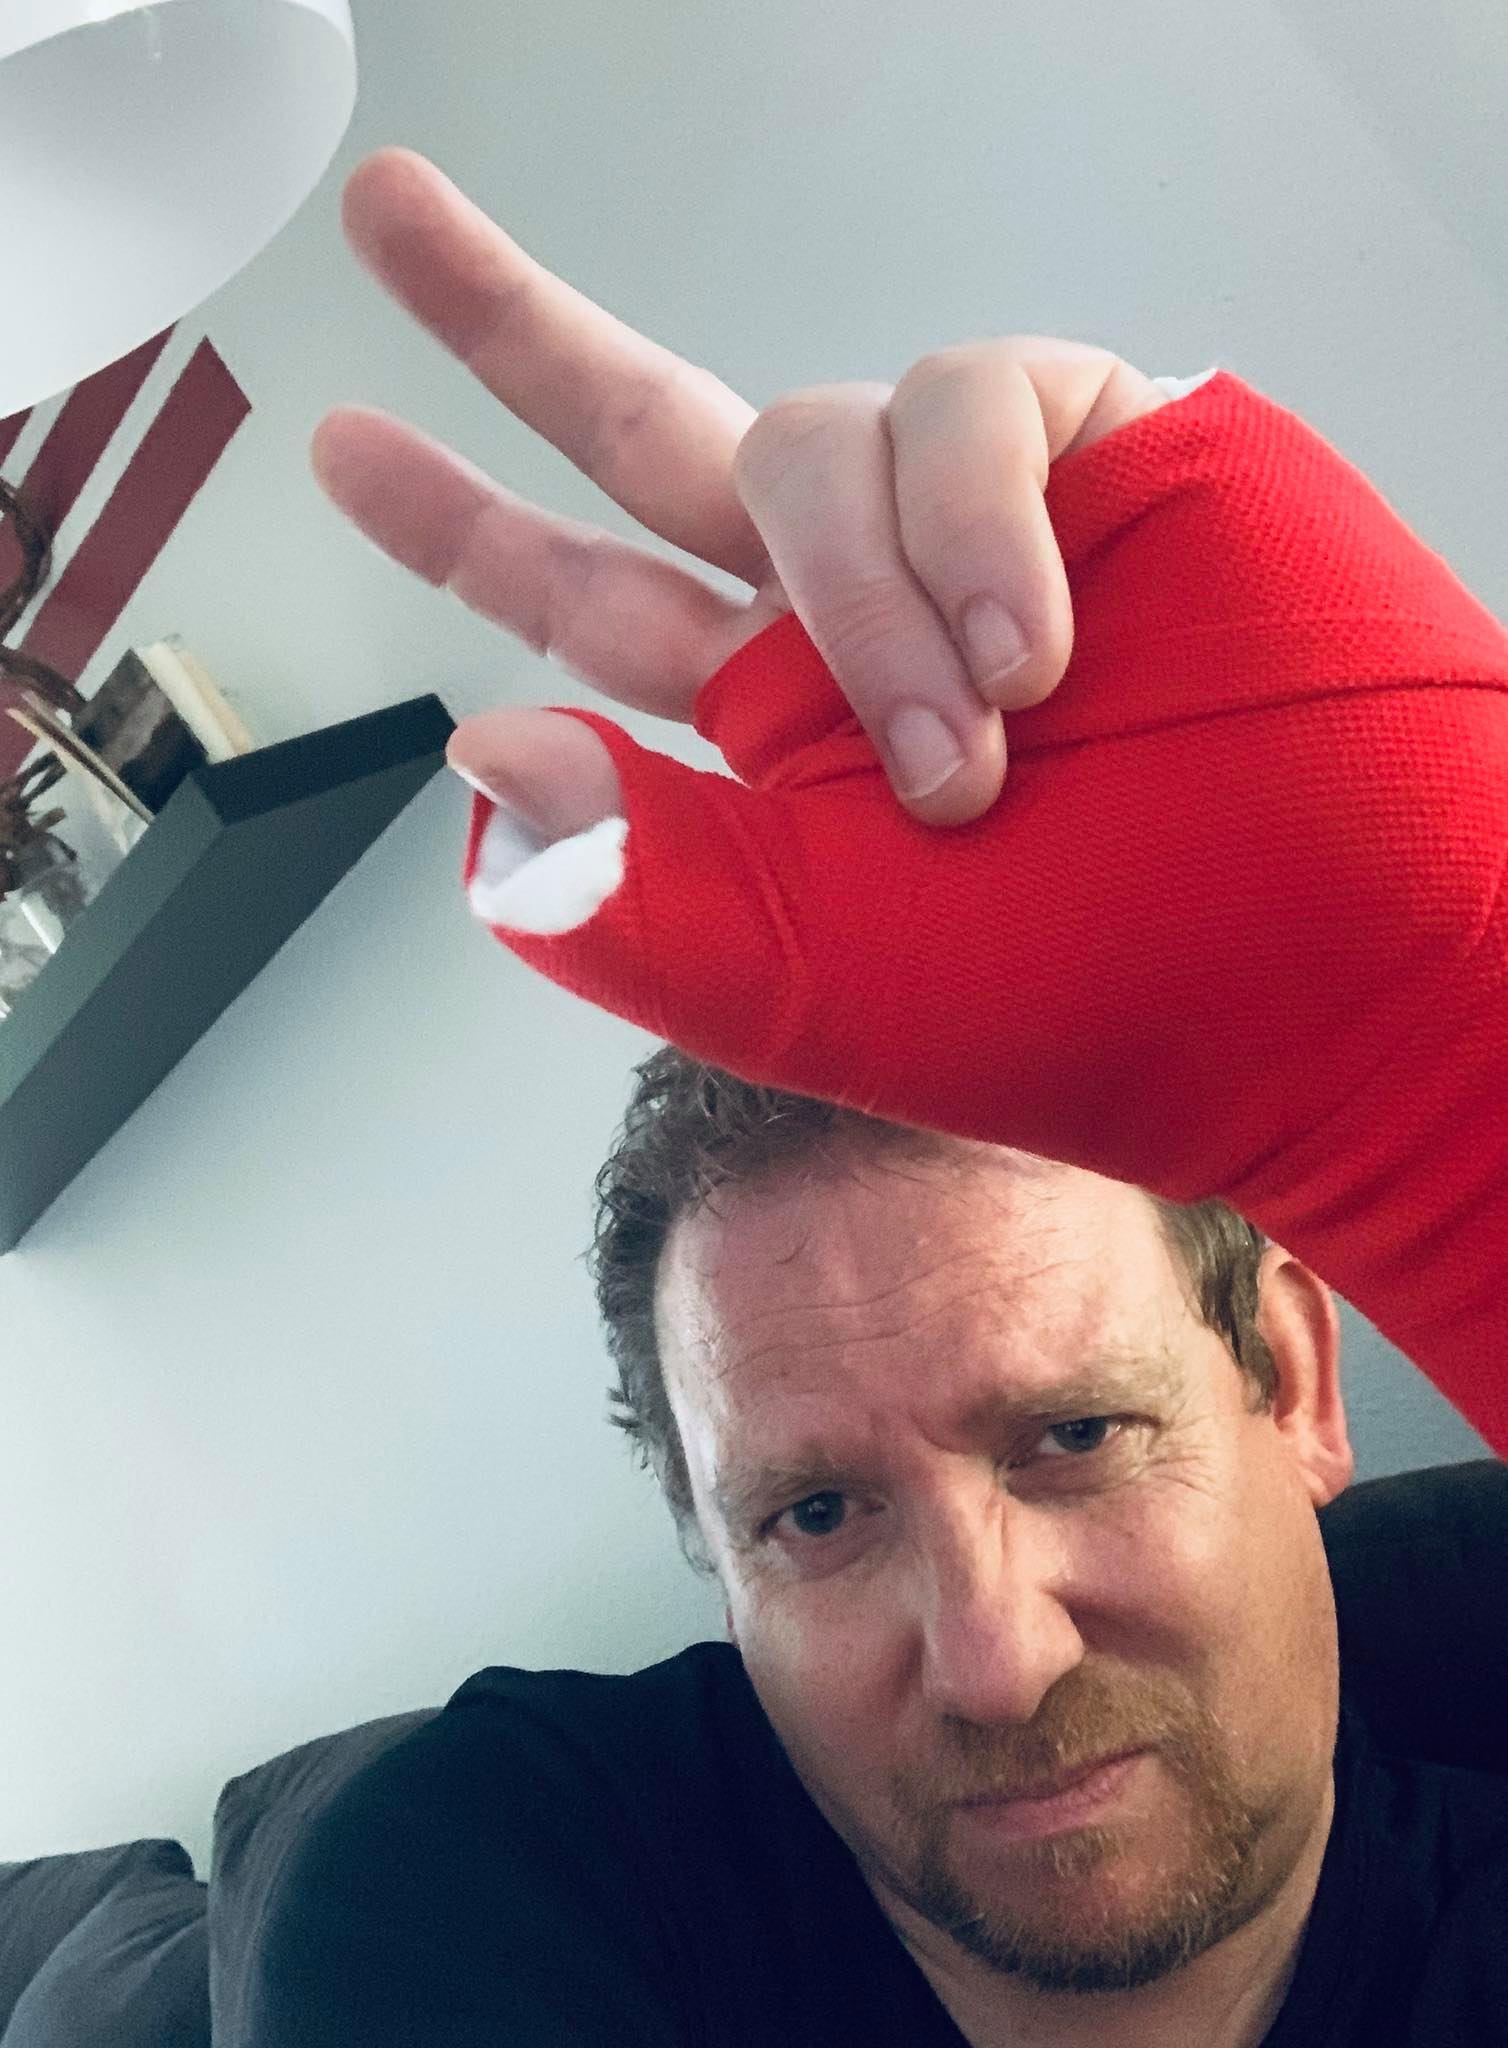 Arnes gebrochener Arm